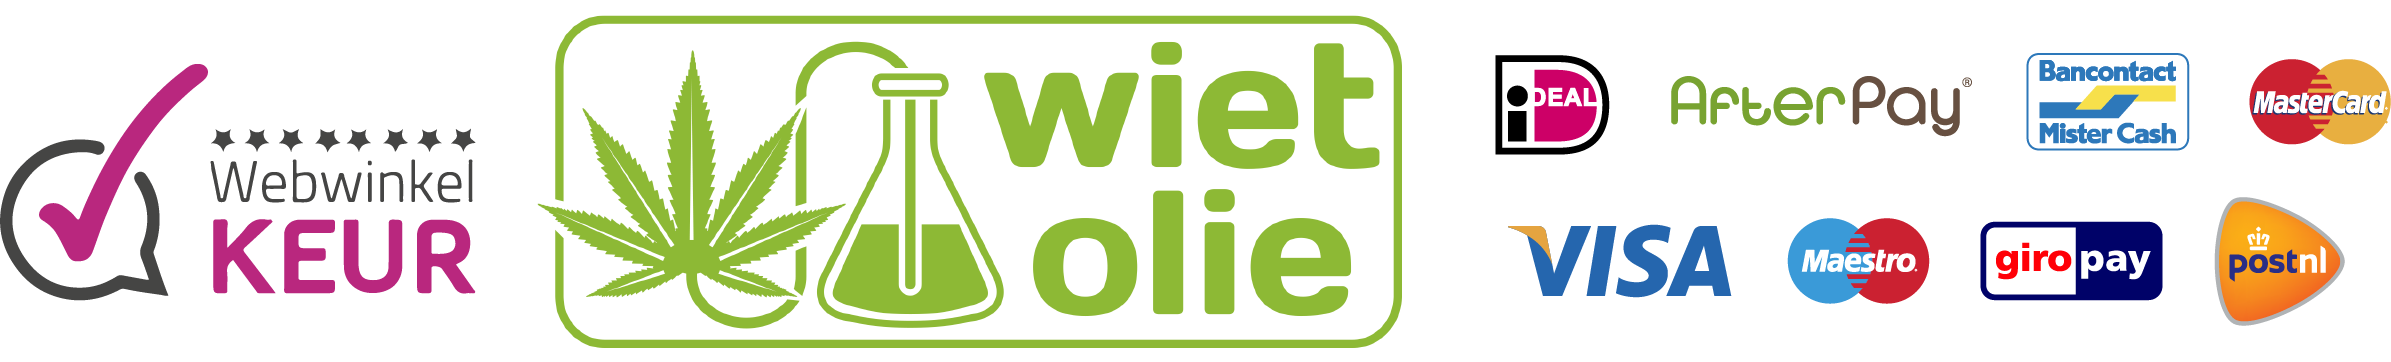 Wietolie.nl I De ruimste keus in CBD-olie!